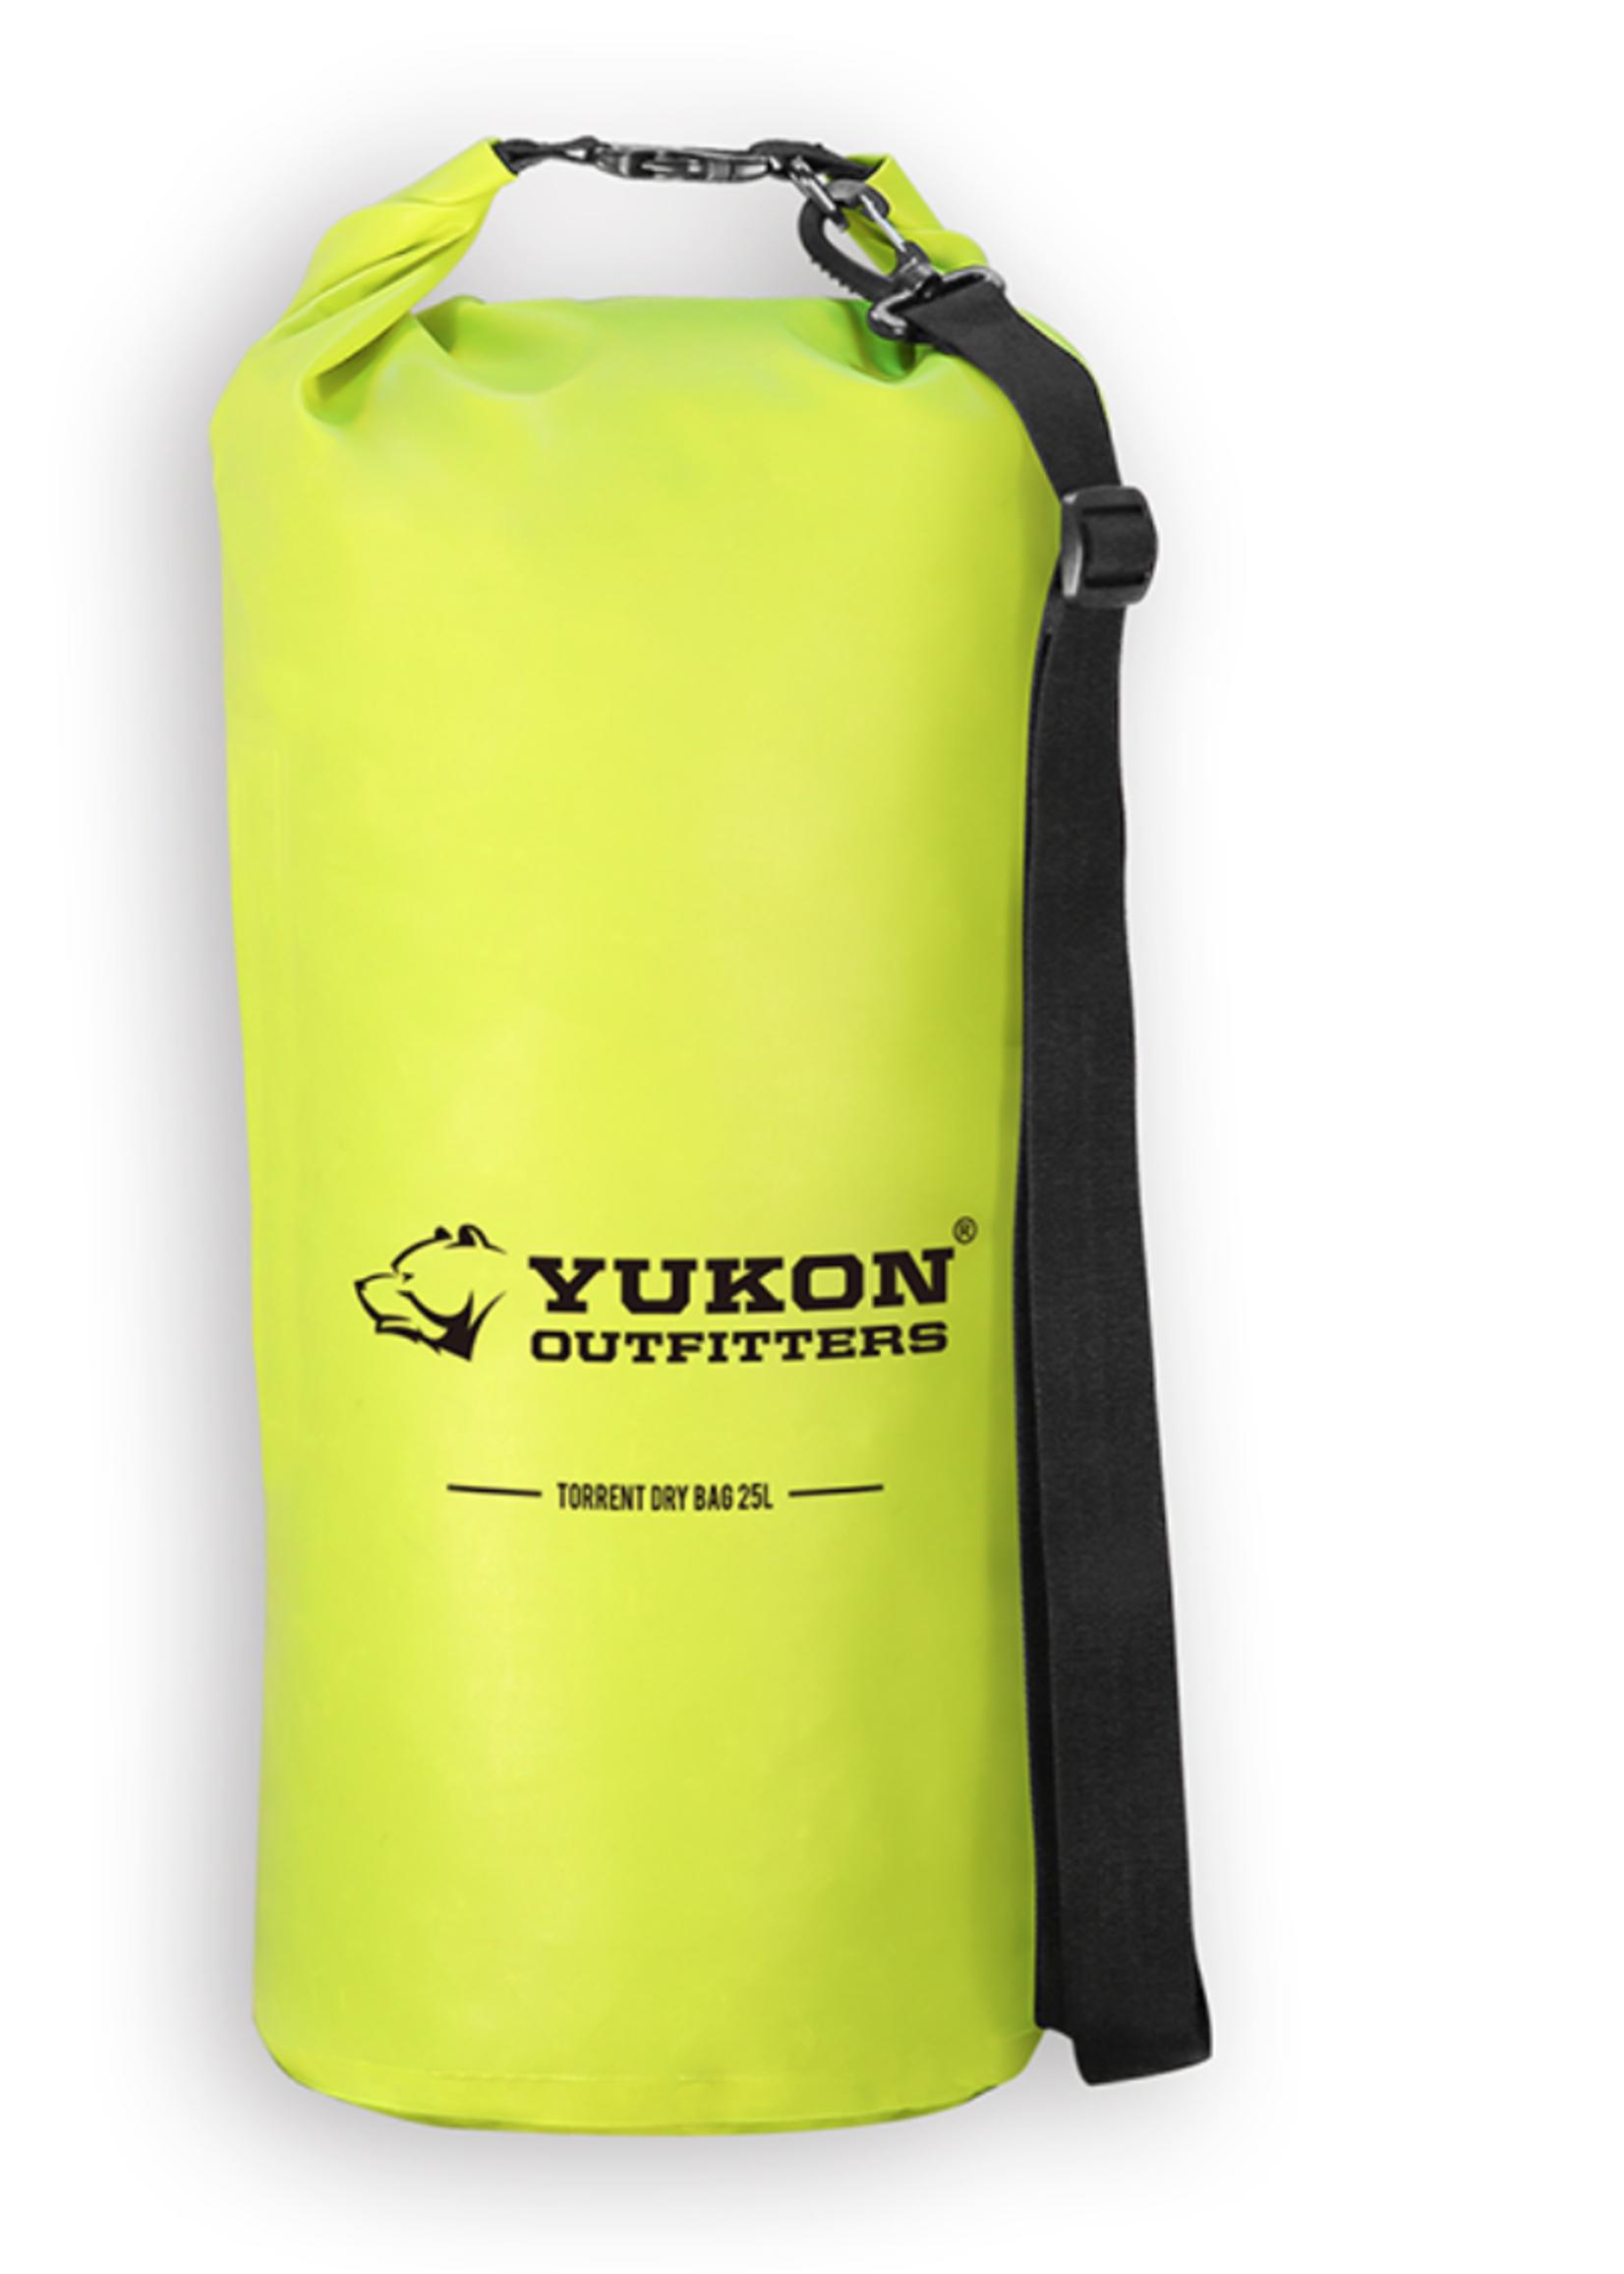 Yukon Outfitters Torrent Dry Bag 25 Hyper Green